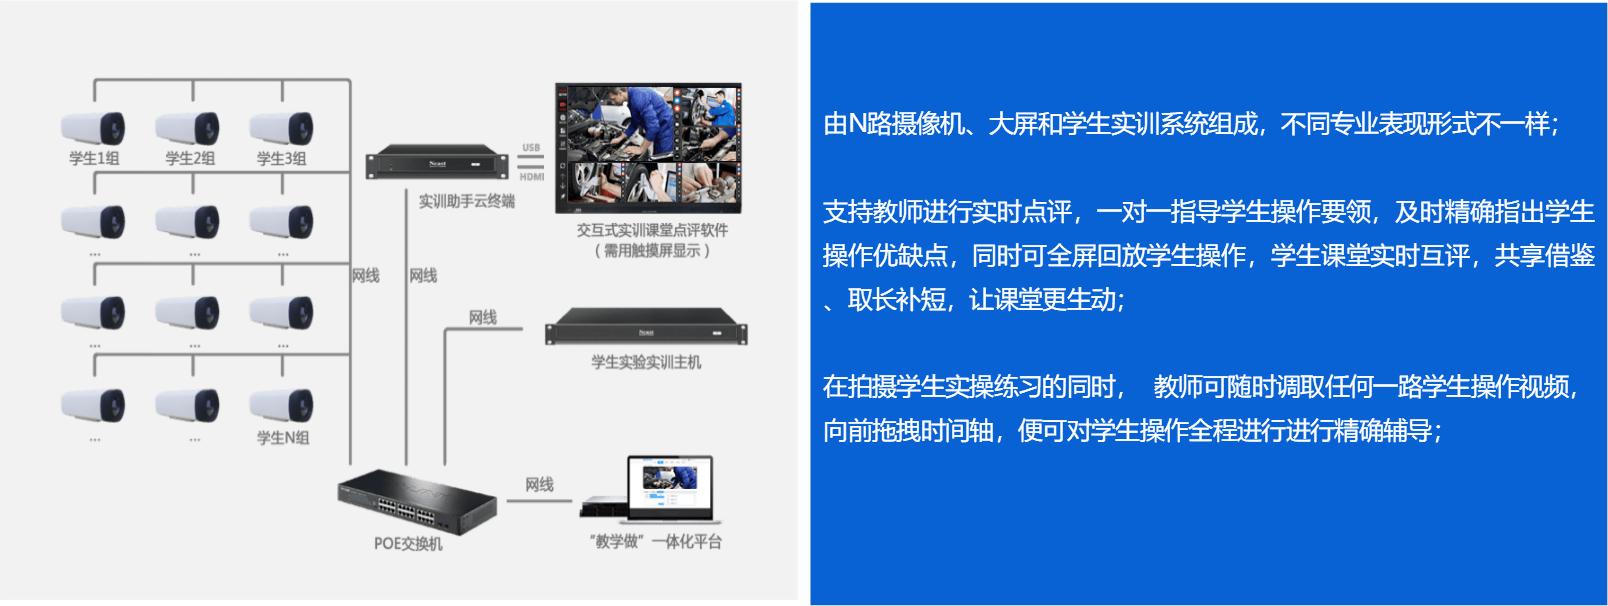 QQ浏览器截图20200605000819